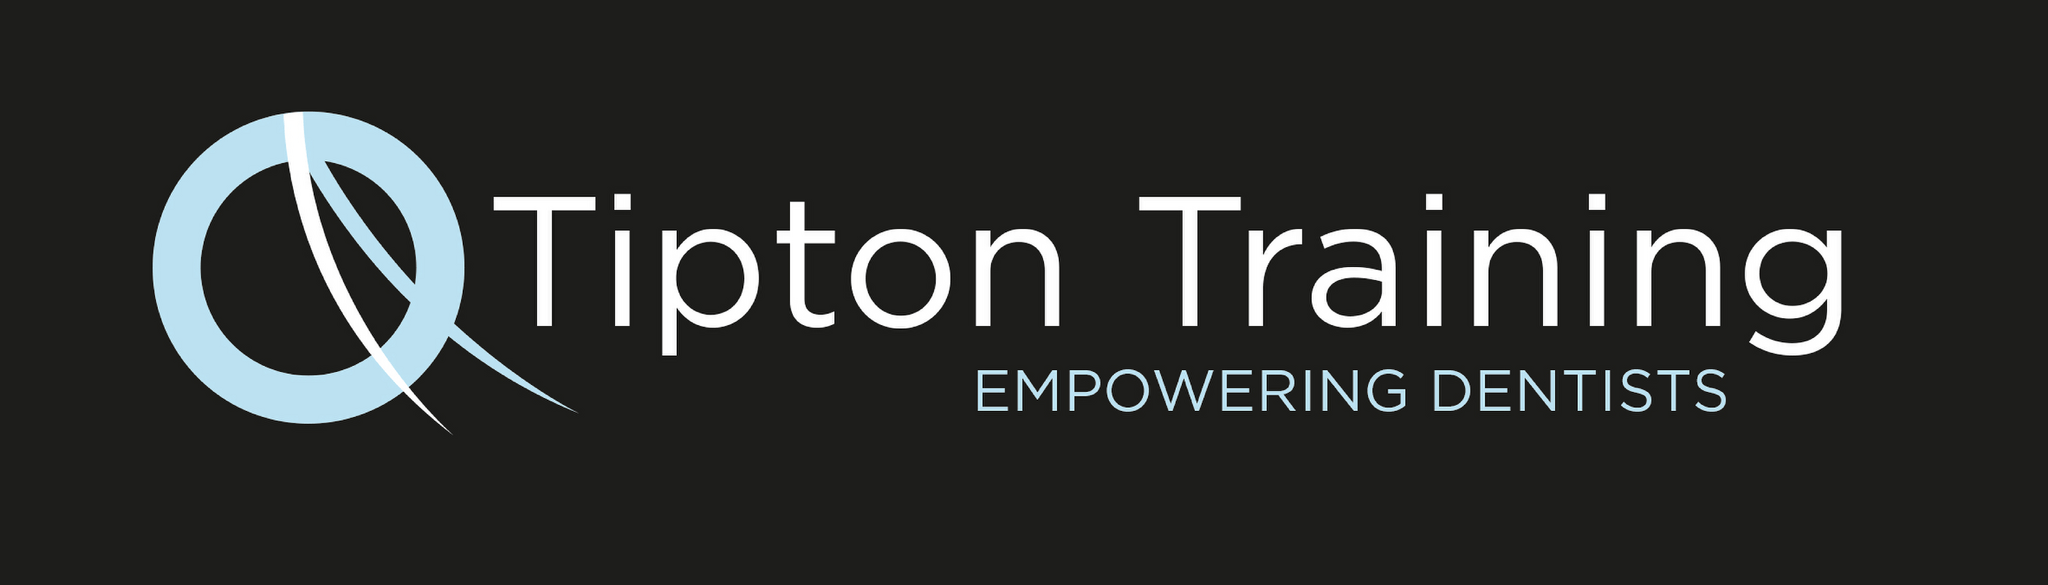 Tipton Training Ltd